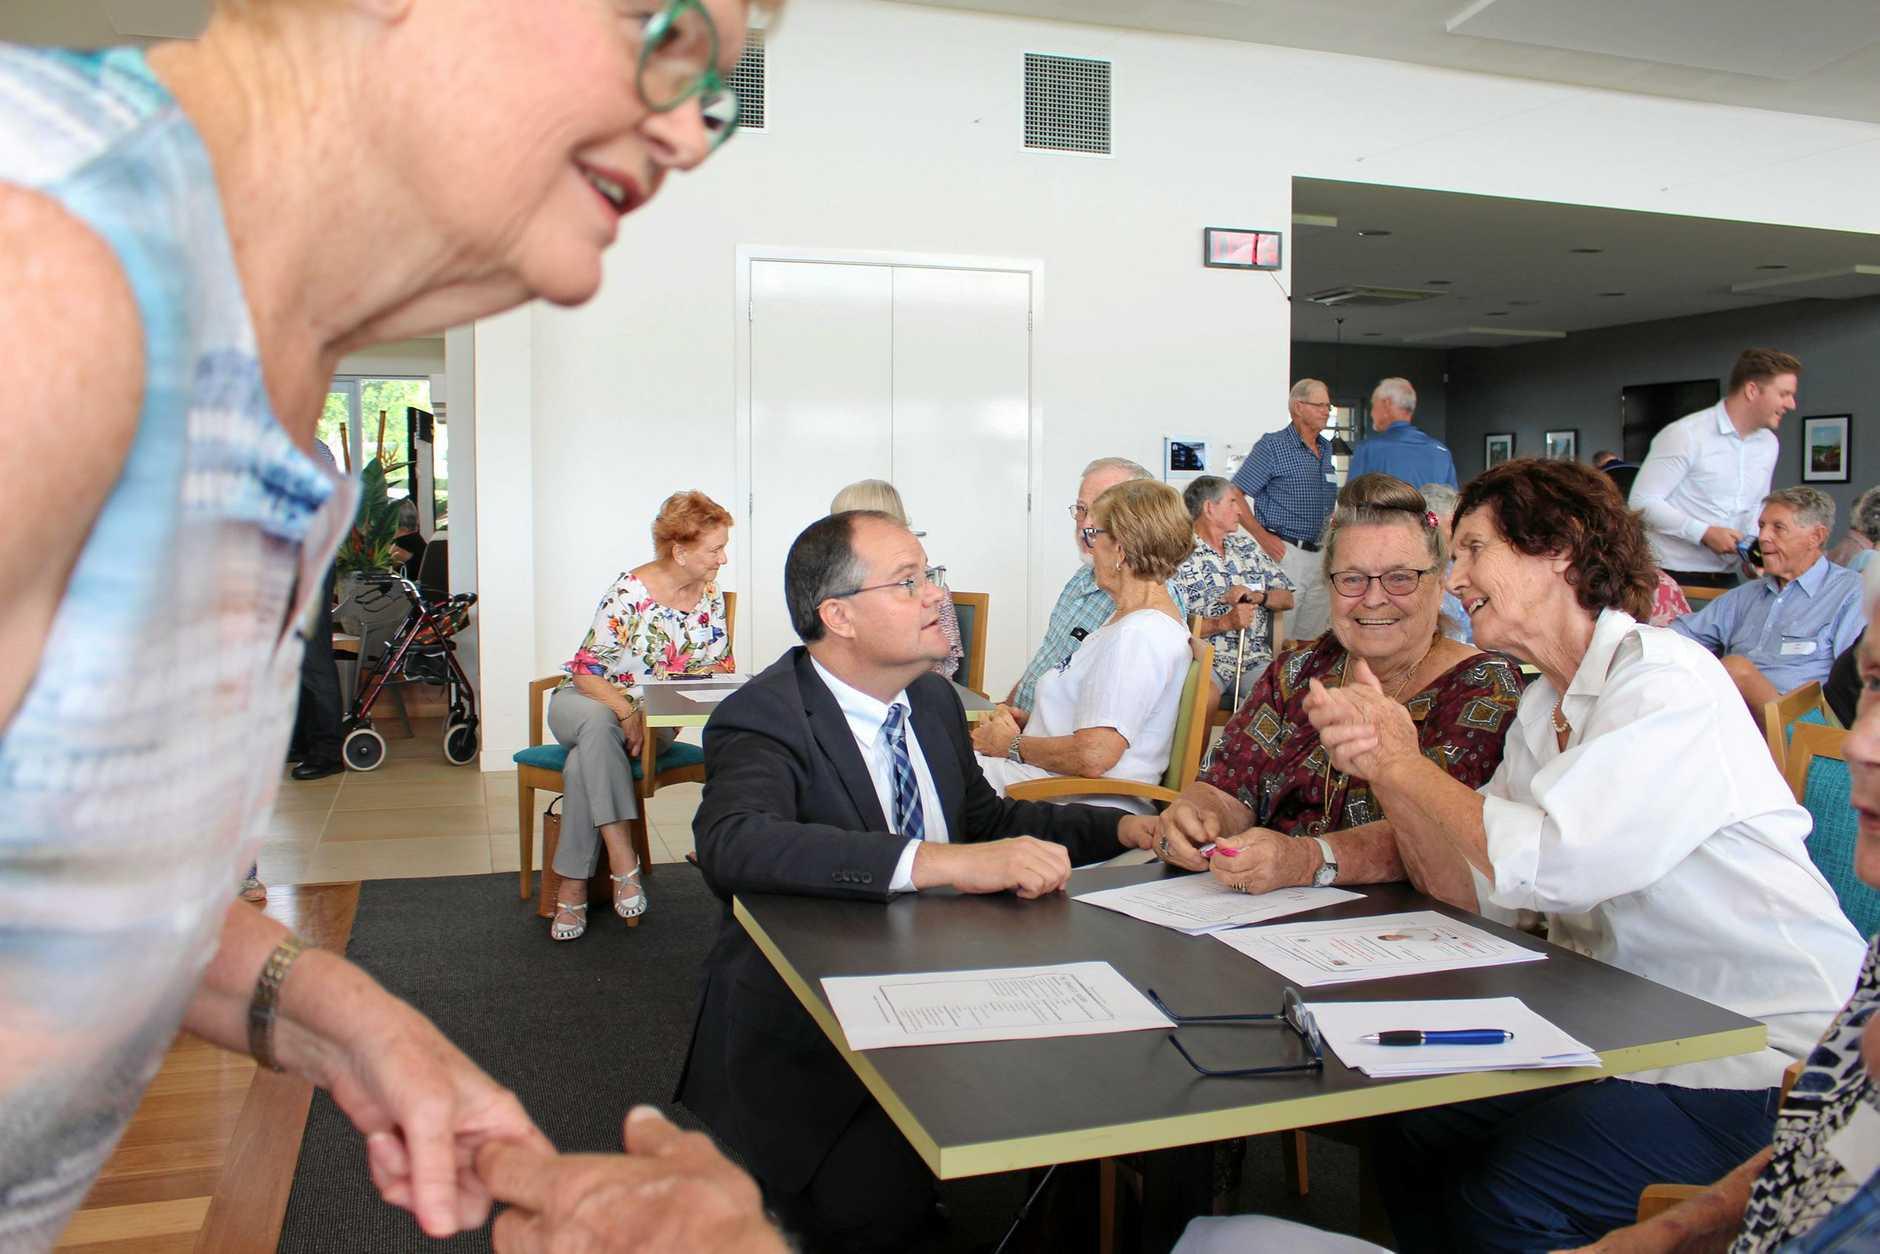 Ted O'Brien talks with attendees at his Fairfax Seniors Forum at Bli Bli.